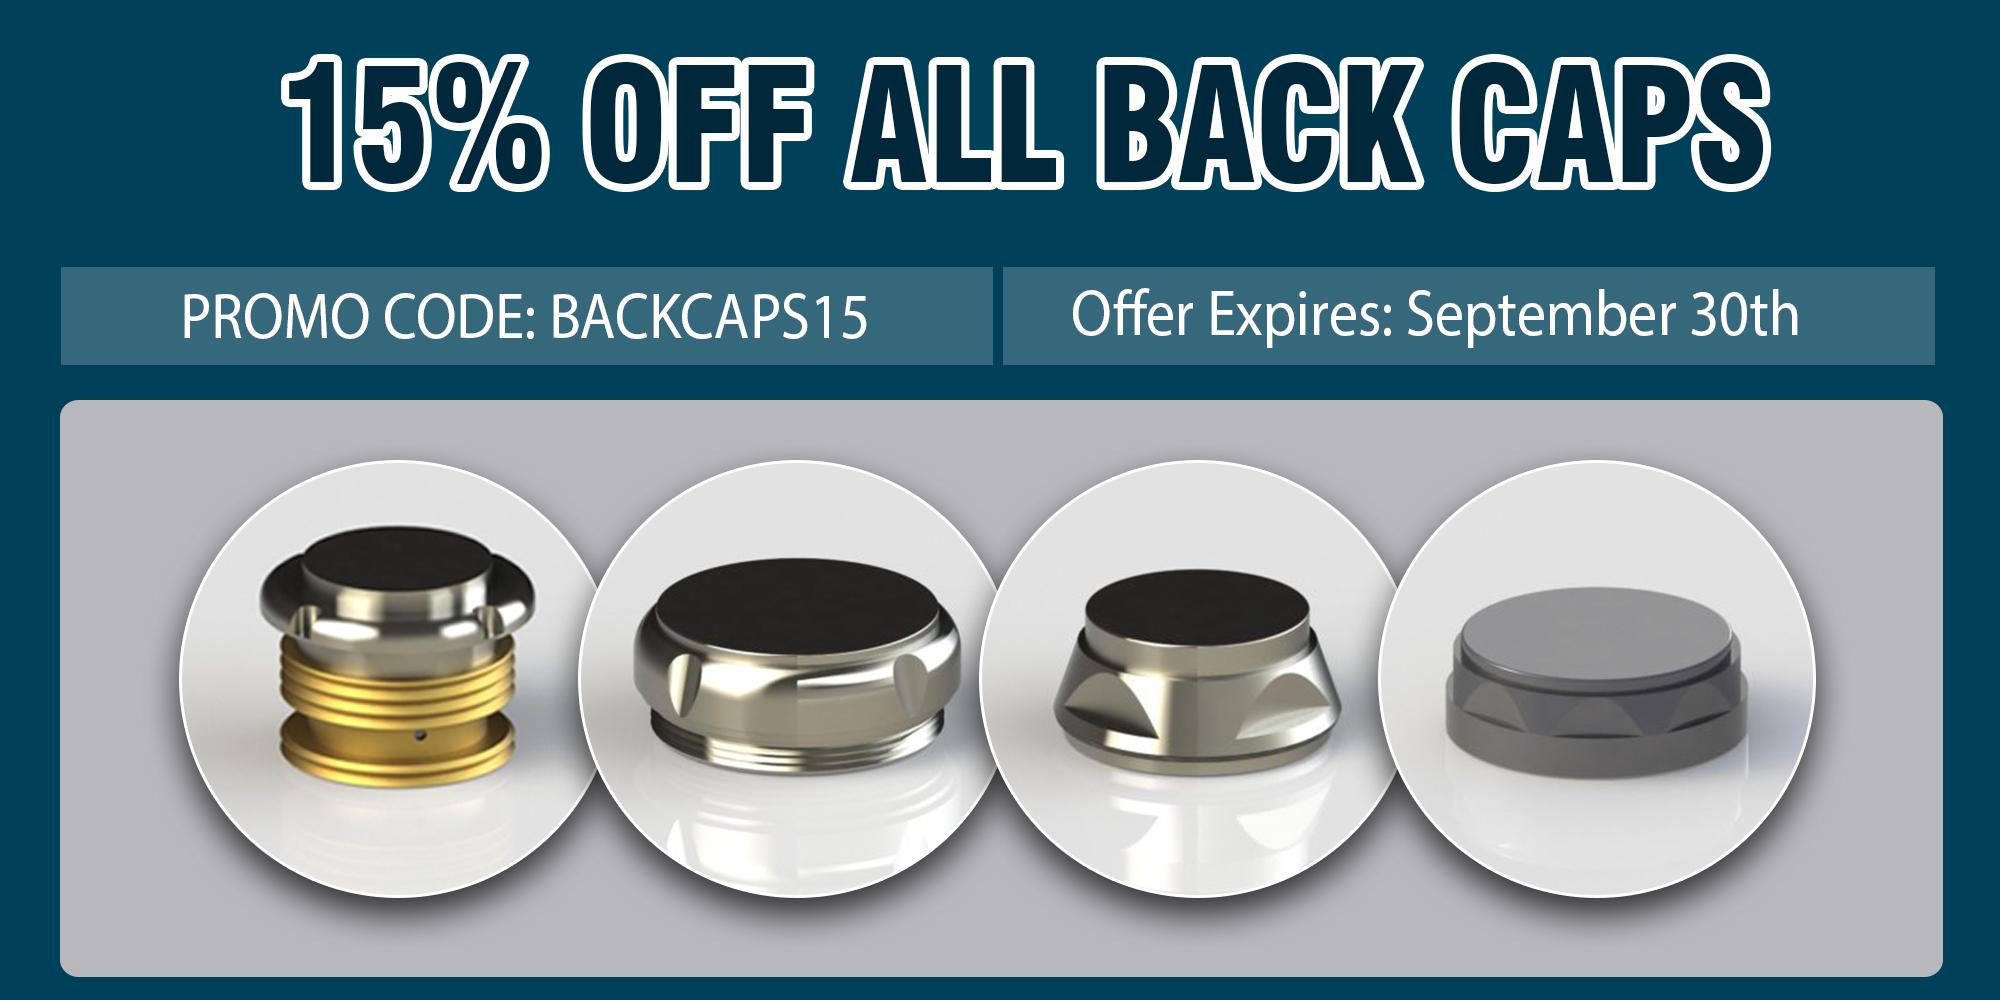 Back cap promo promotion banner from Premium Handpiece Parts